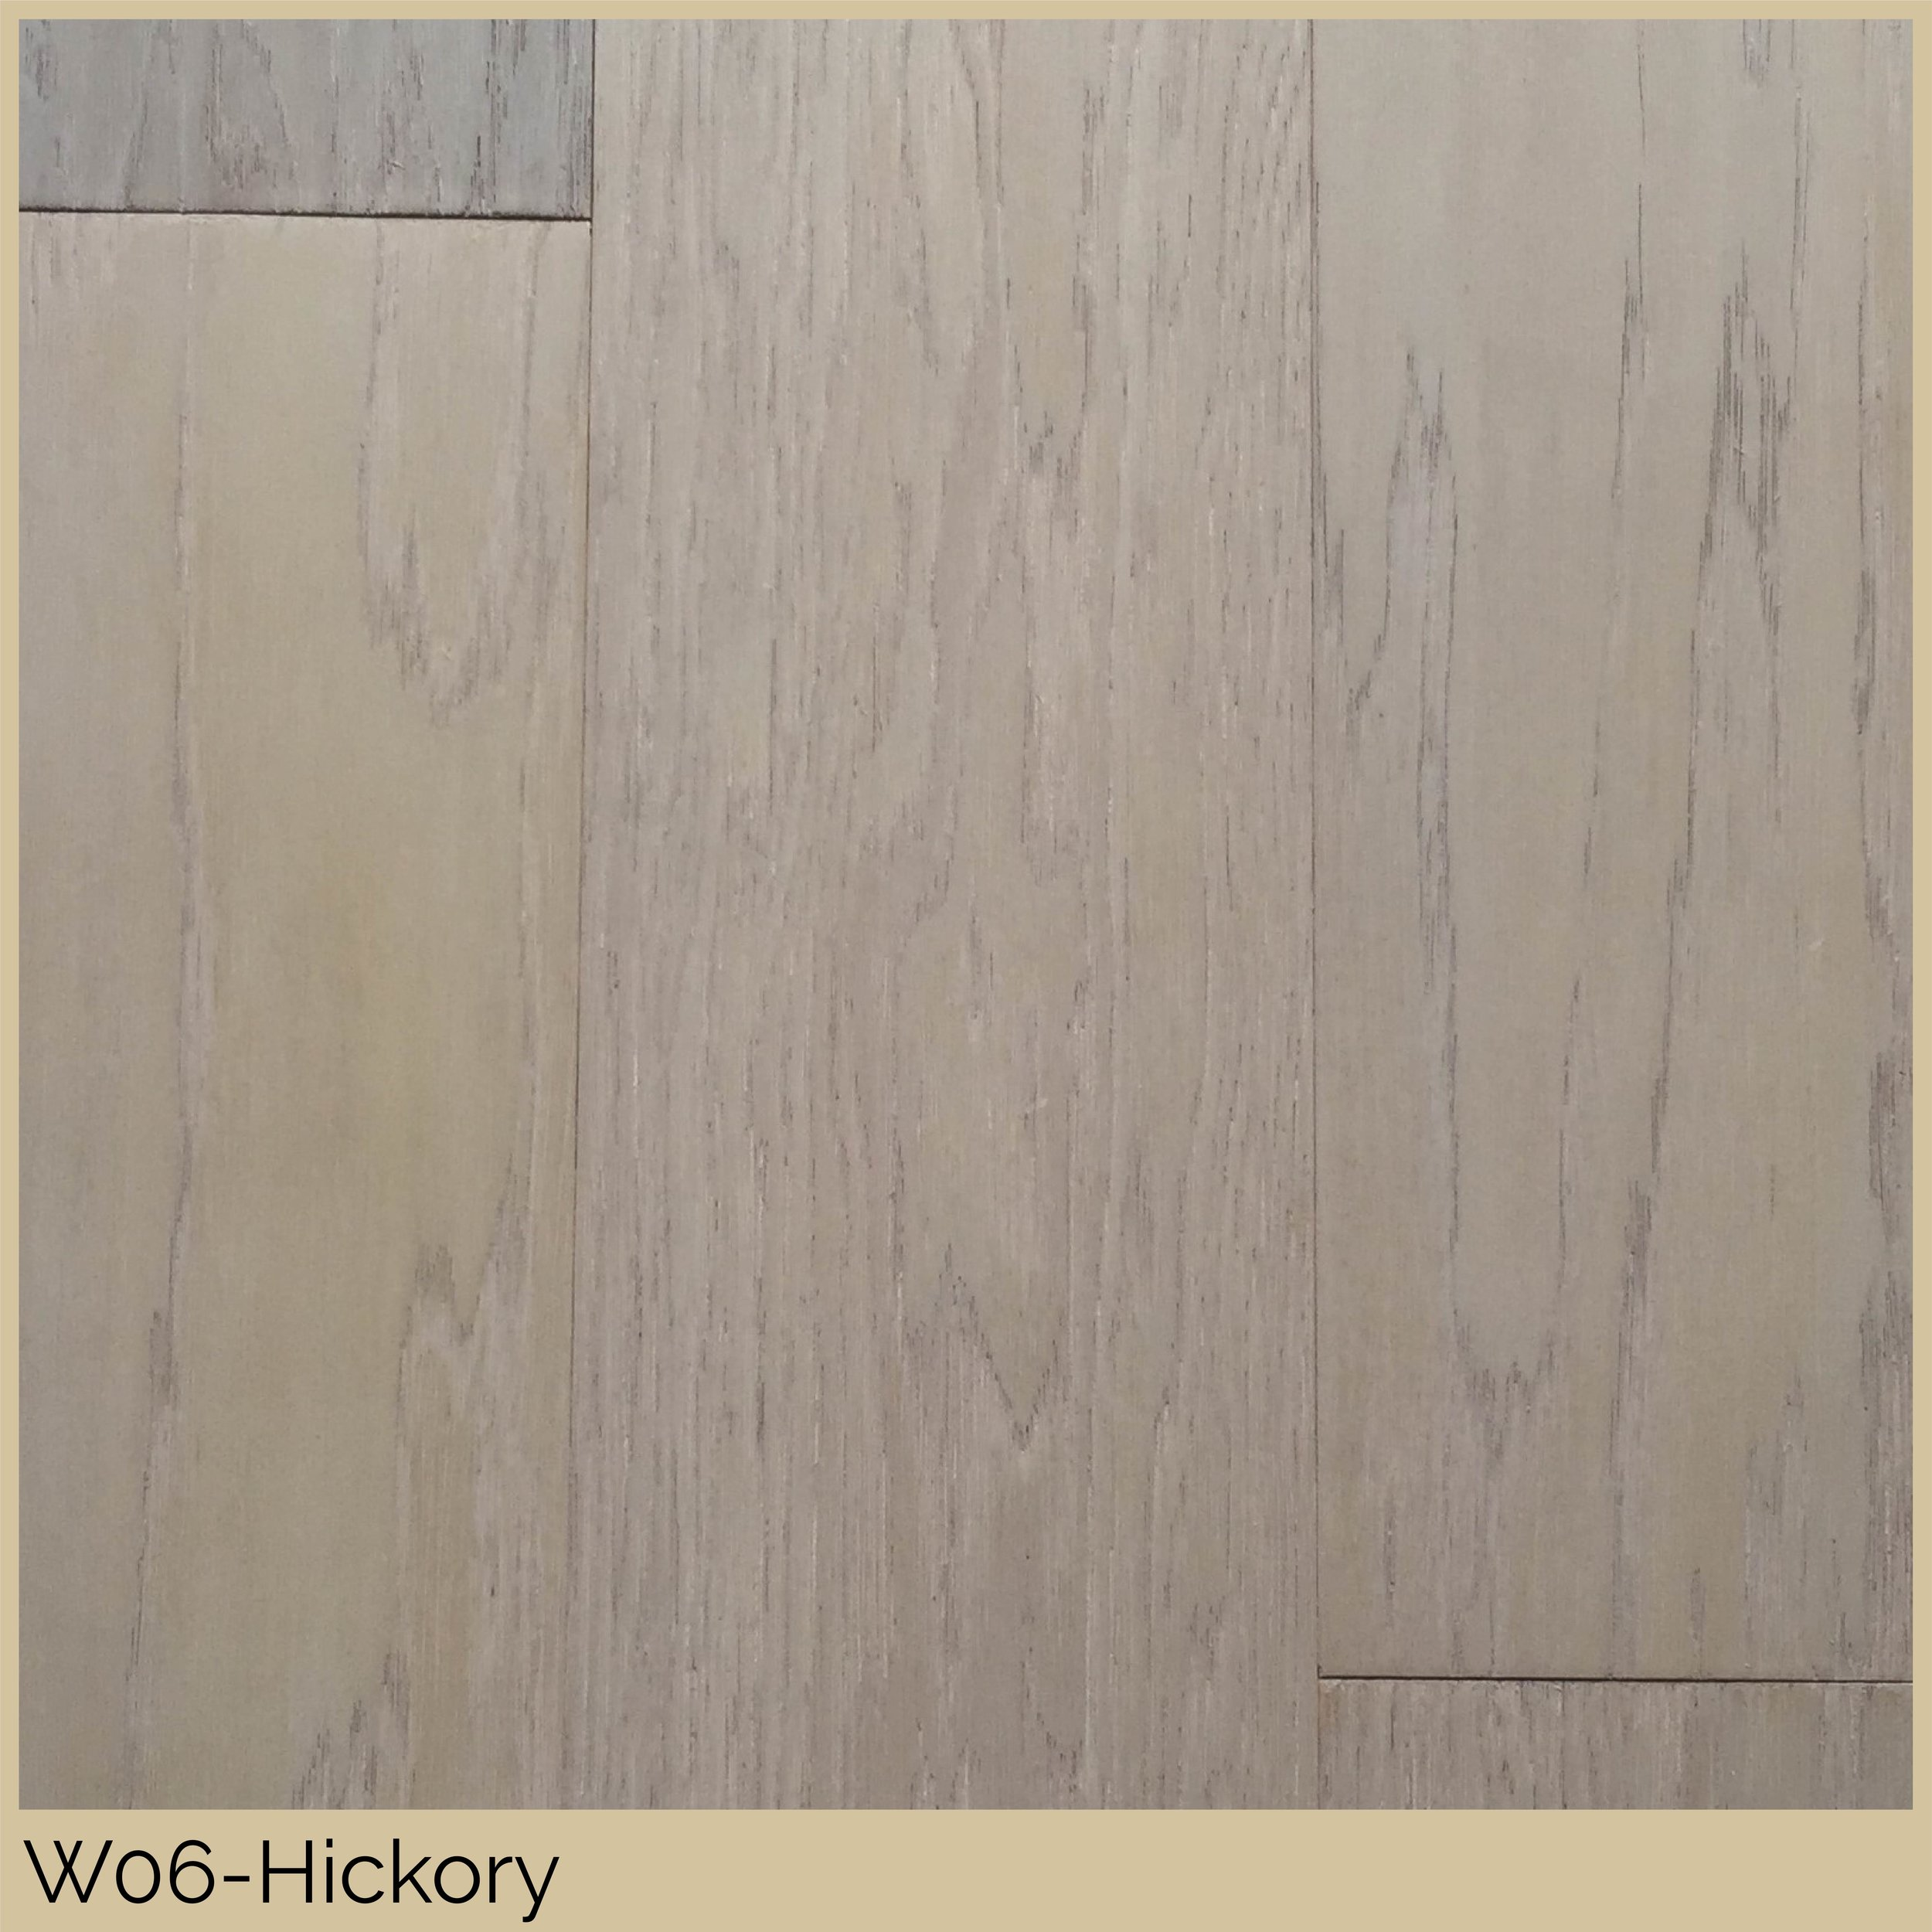 W06-Hickory.jpg